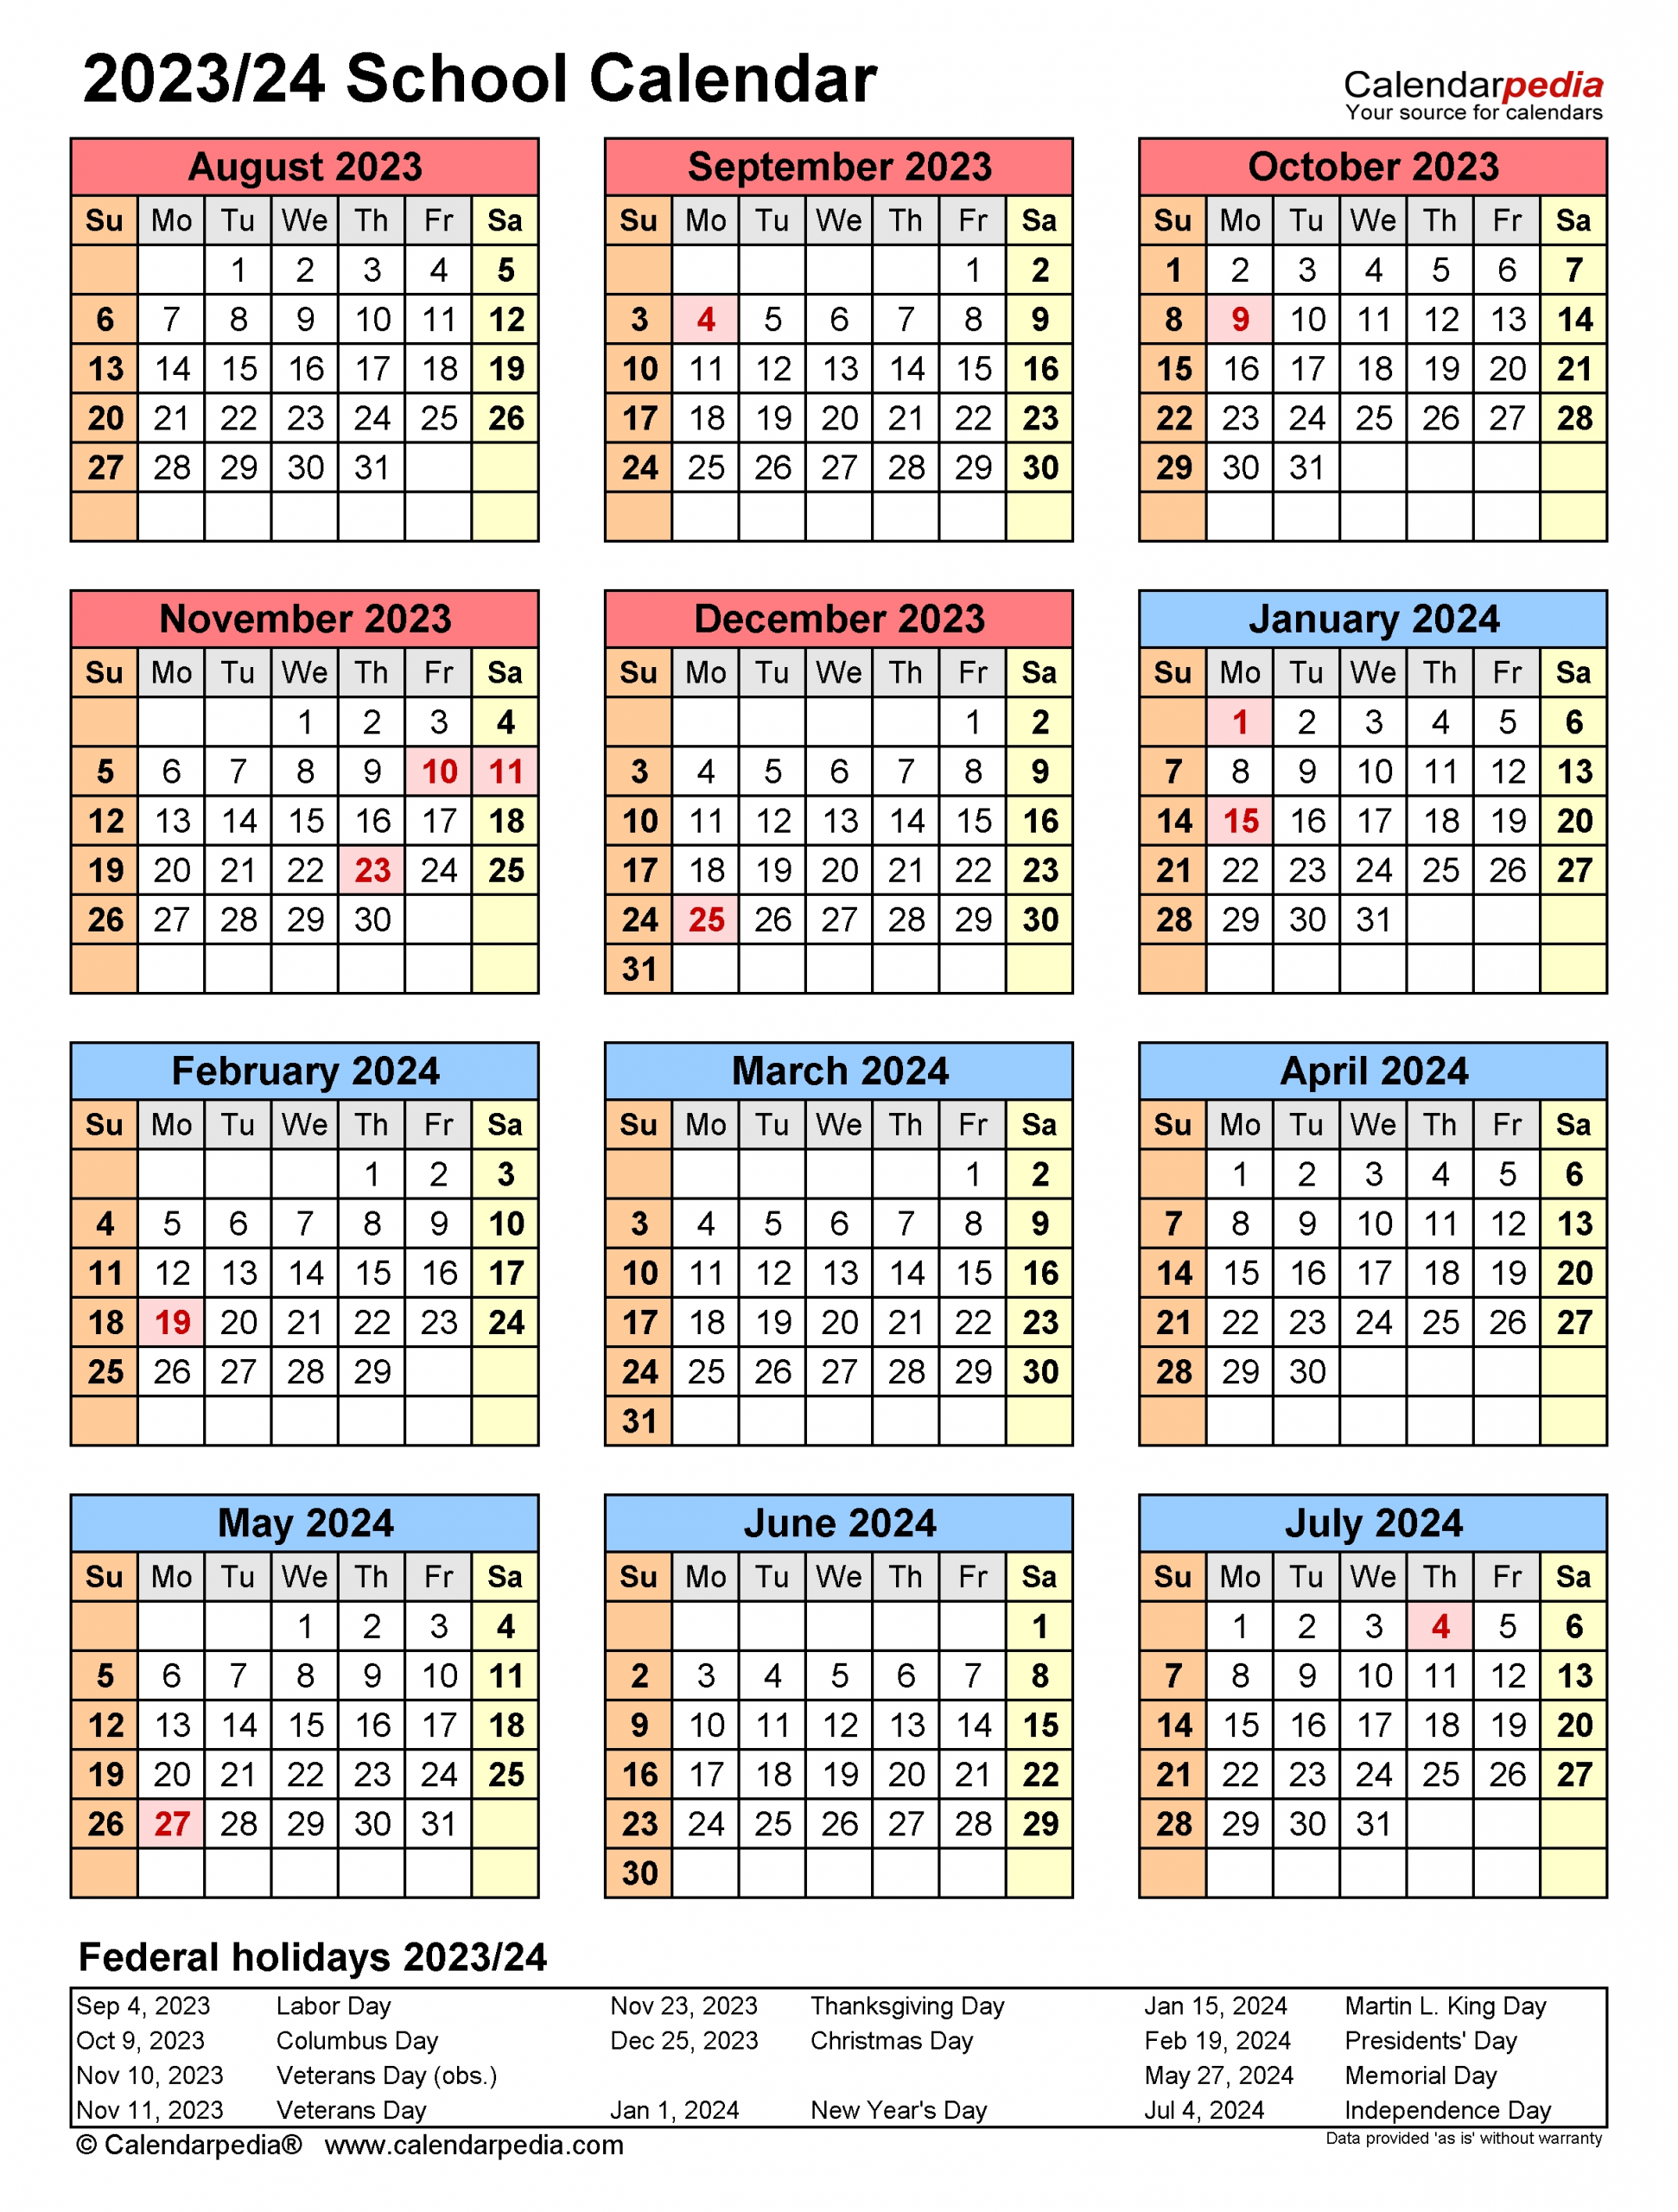 School Calendars 2023/2024 - Free Printable Pdf Templates